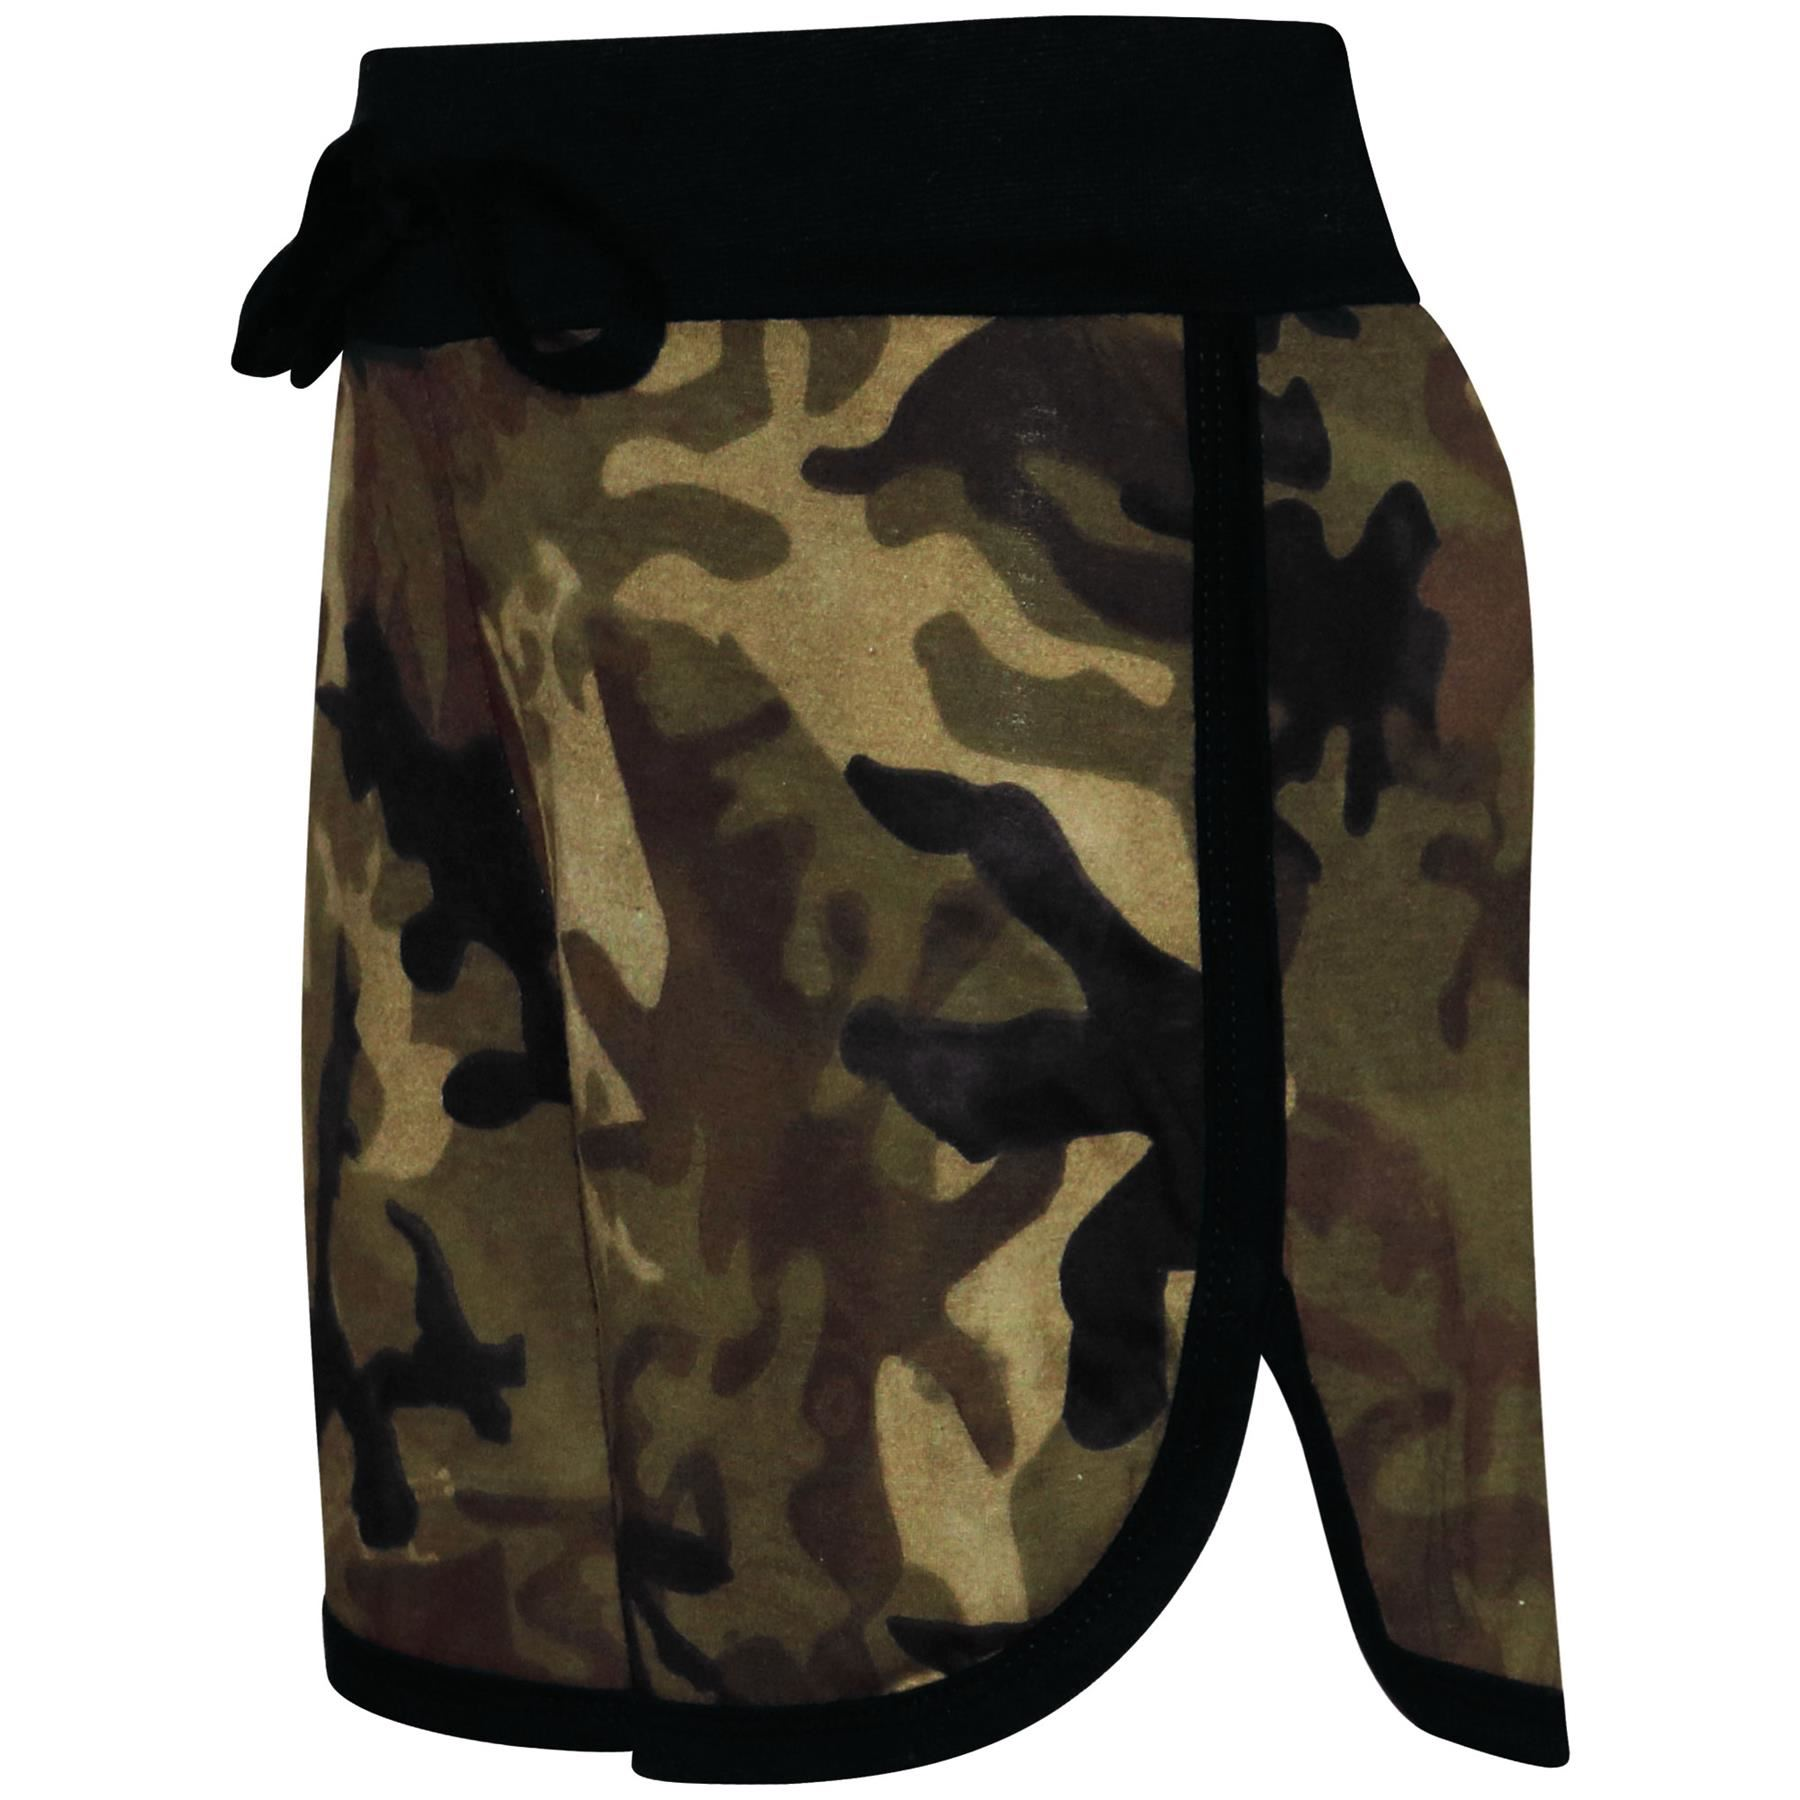 Kids-Girls-Shorts-100-Cotton-Dance-Gym-Sports-Summer-Hot-Short-Pants-2-13-Years Indexbild 19